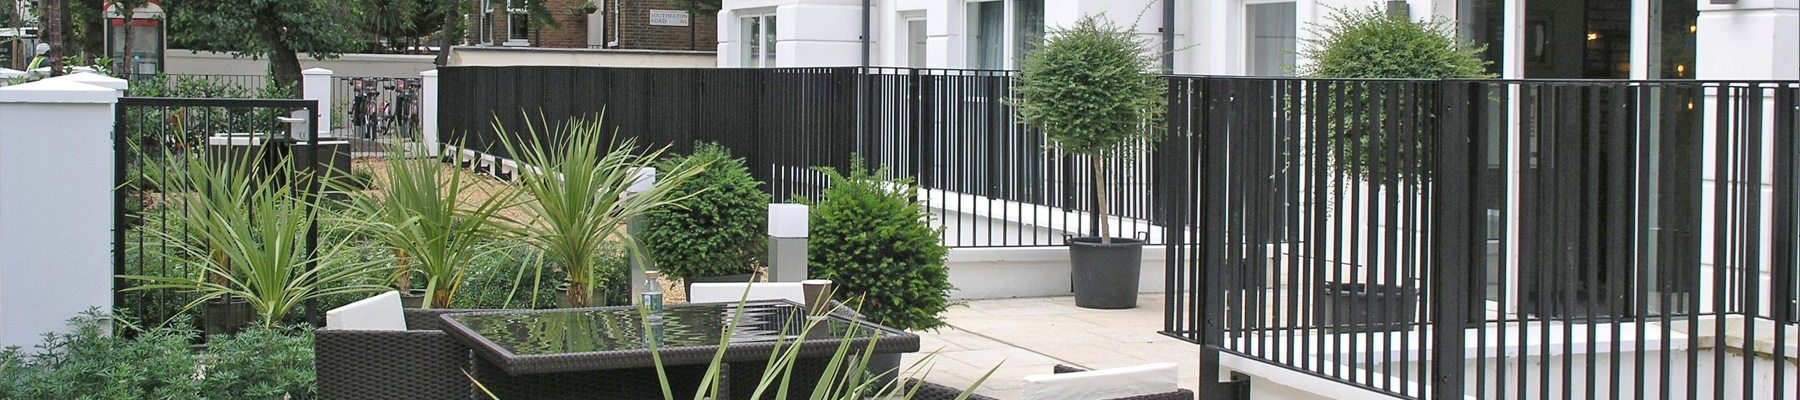 banner-Lang+Fulton-Rimini-flat-bar-railing-fence-Lumar-Hotel-Hammersmith-3